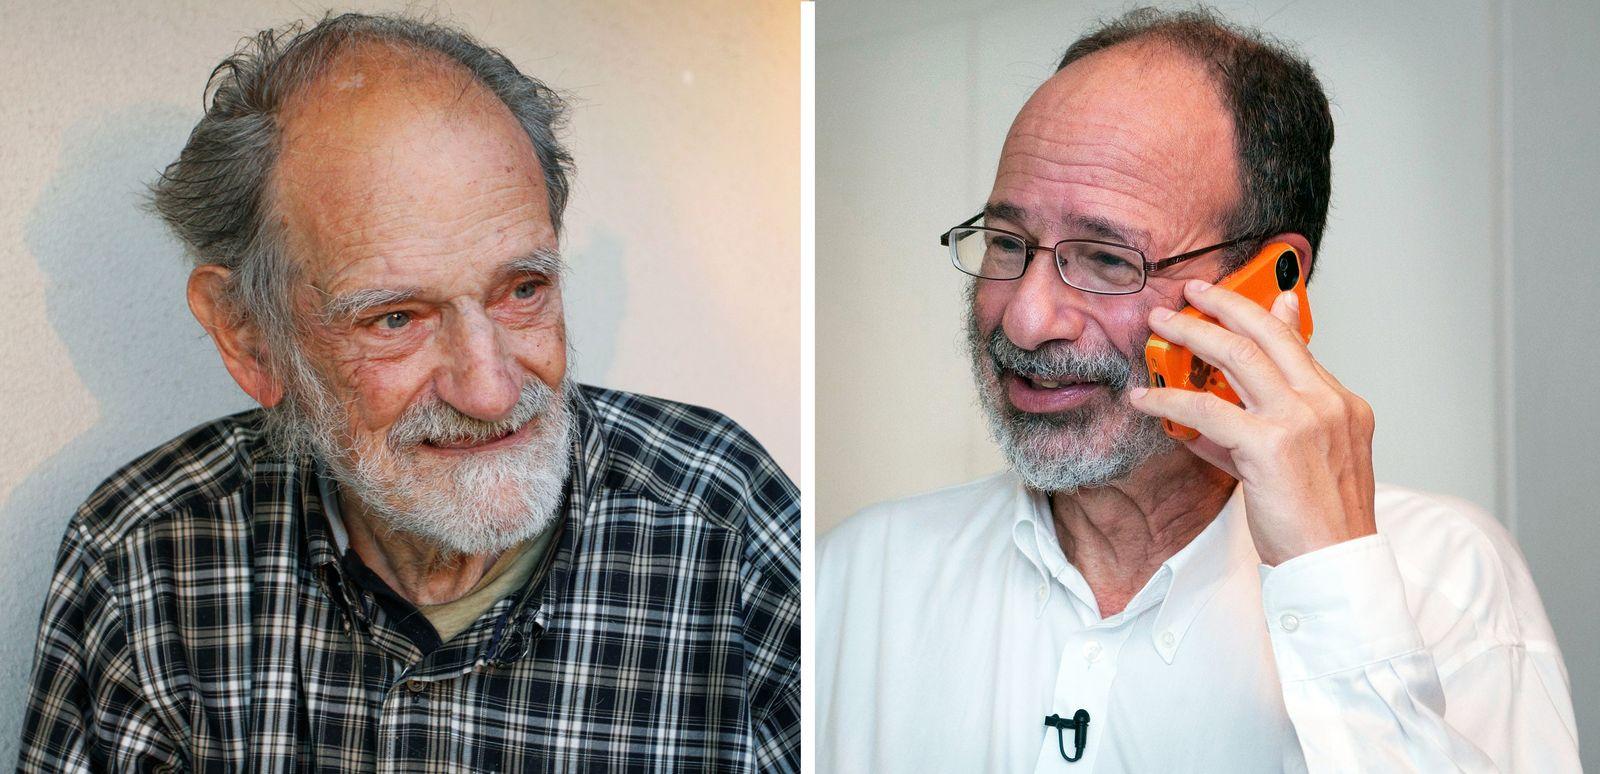 Nobelpreis Wiortschaft 2012 / Shapley / Roth / Kombo